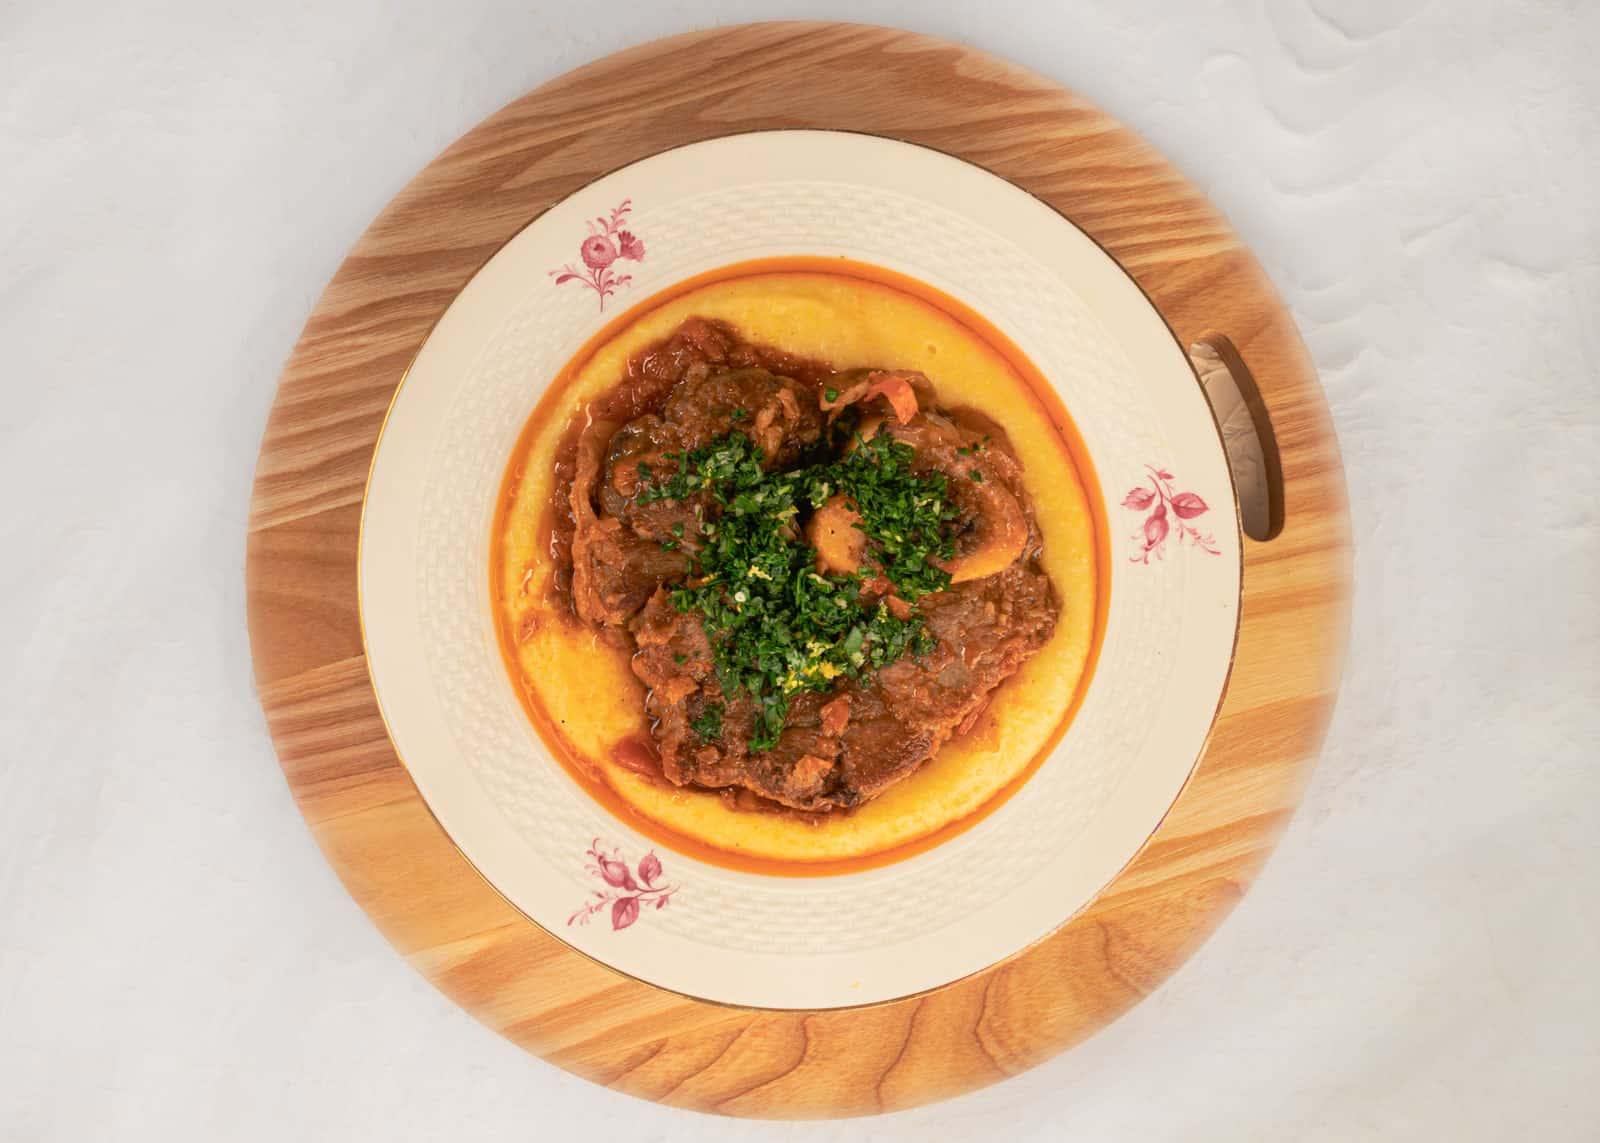 Braised veal -Ossobuco alla milanese